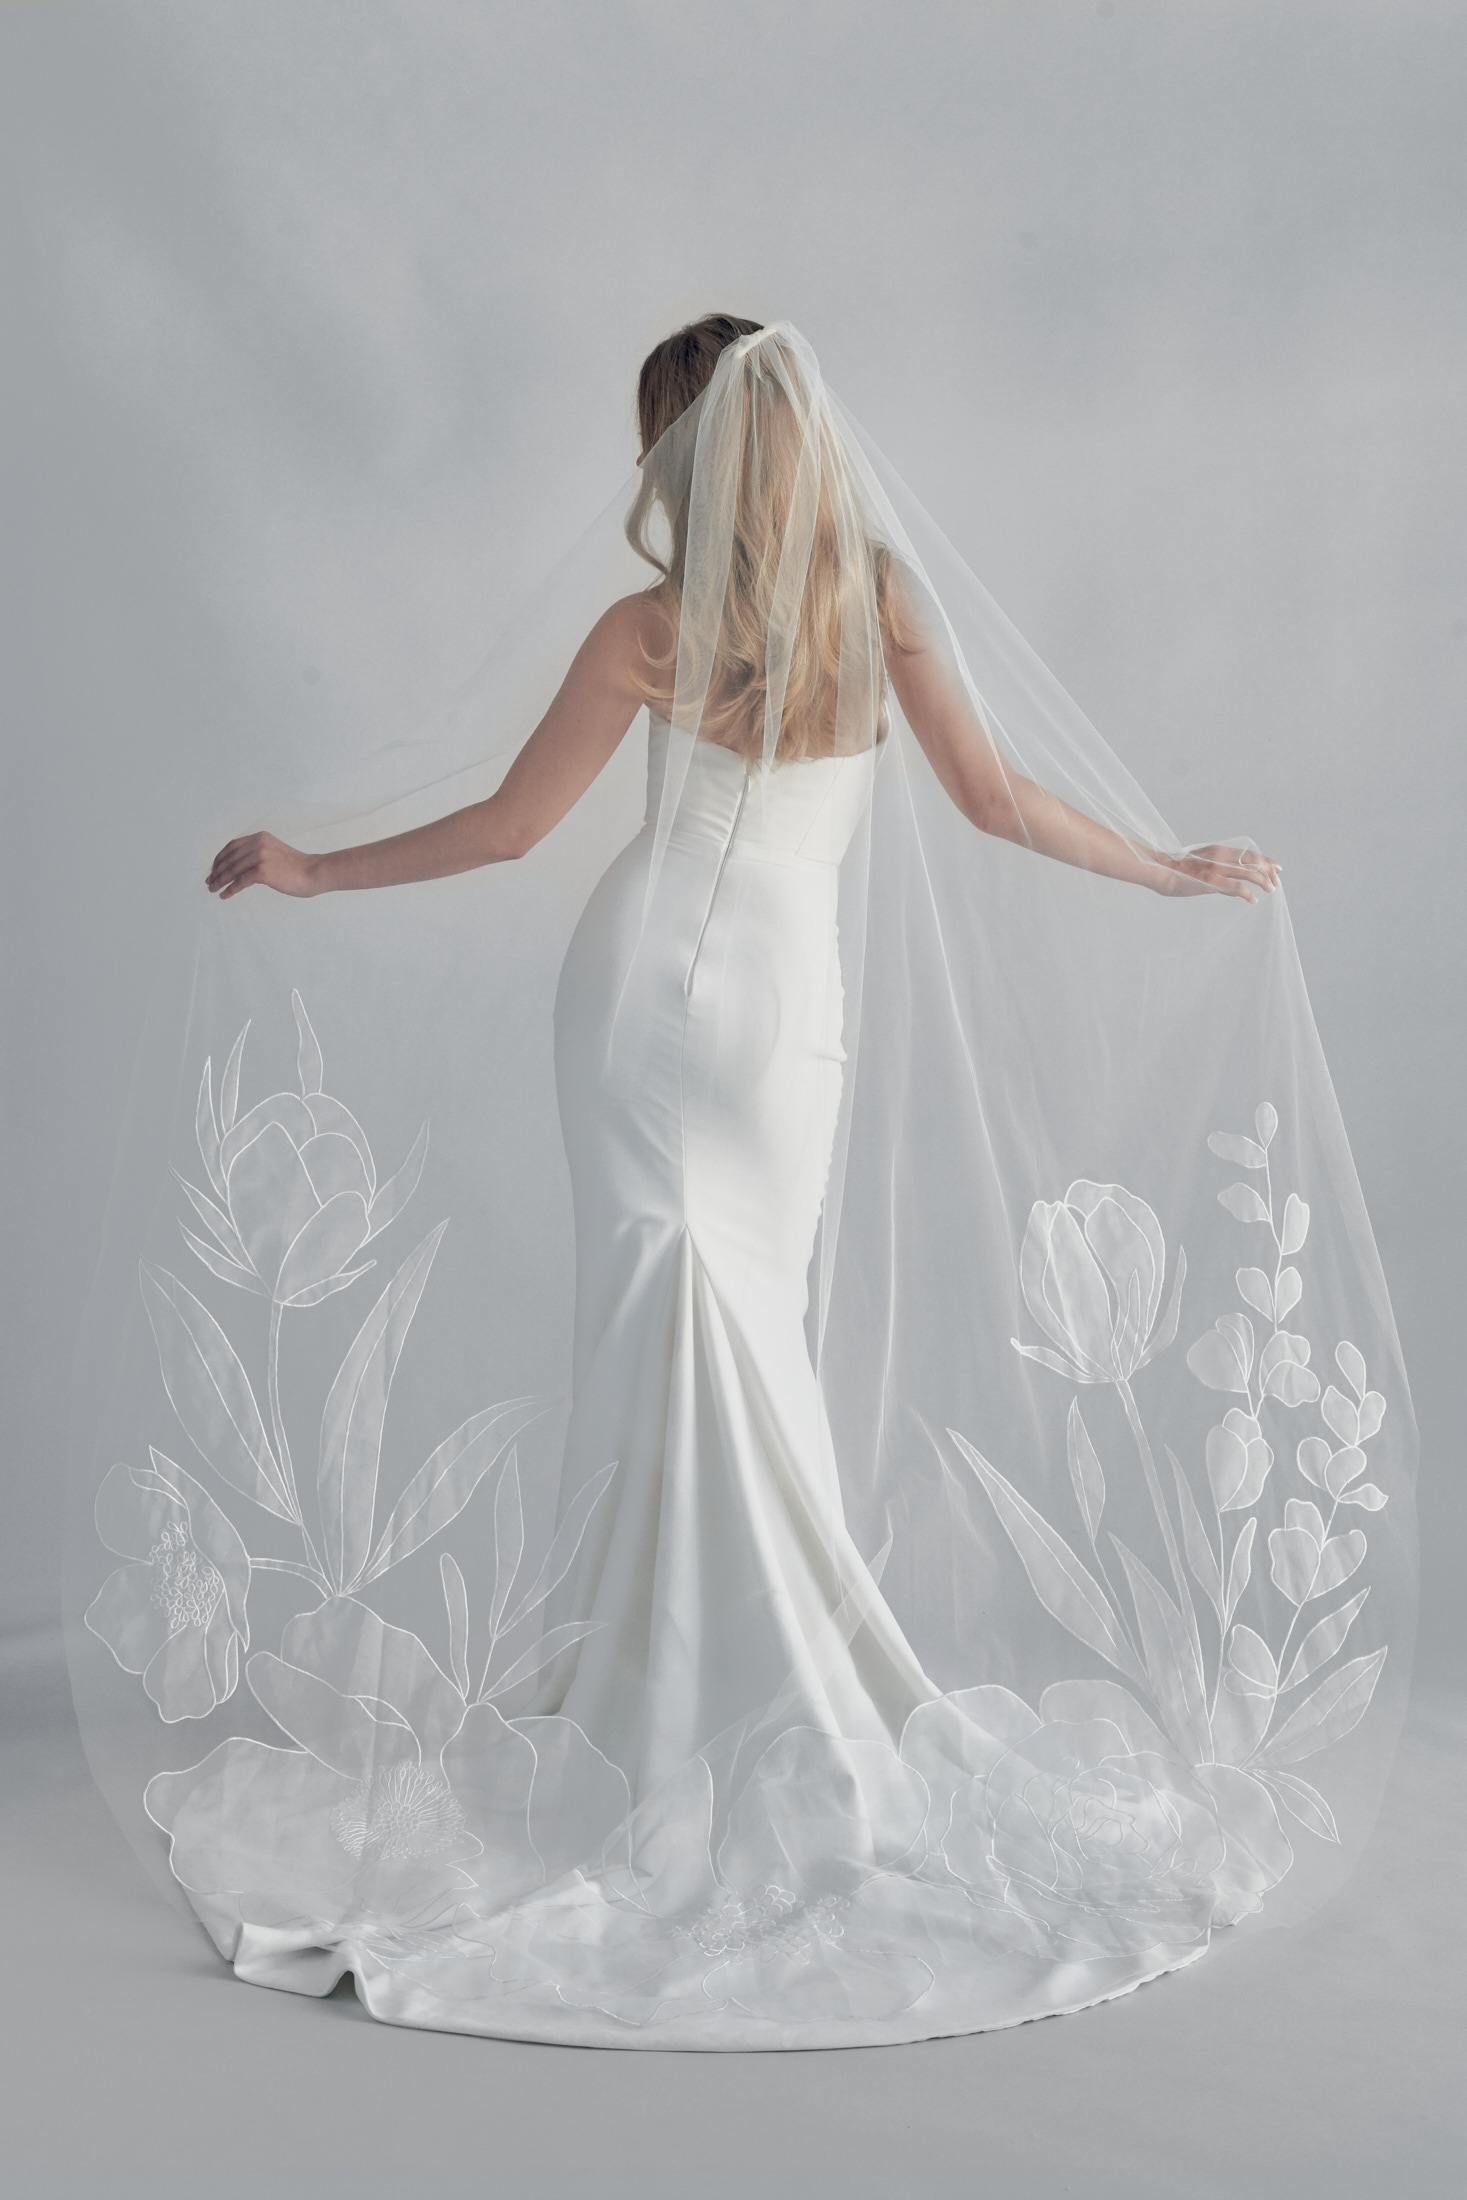 Bloom Alli Koch Wedding Veil Collab New Phrenology Plain Wedding Dress Wedding Veil Wedding Dress With Veil [ 2200 x 1467 Pixel ]